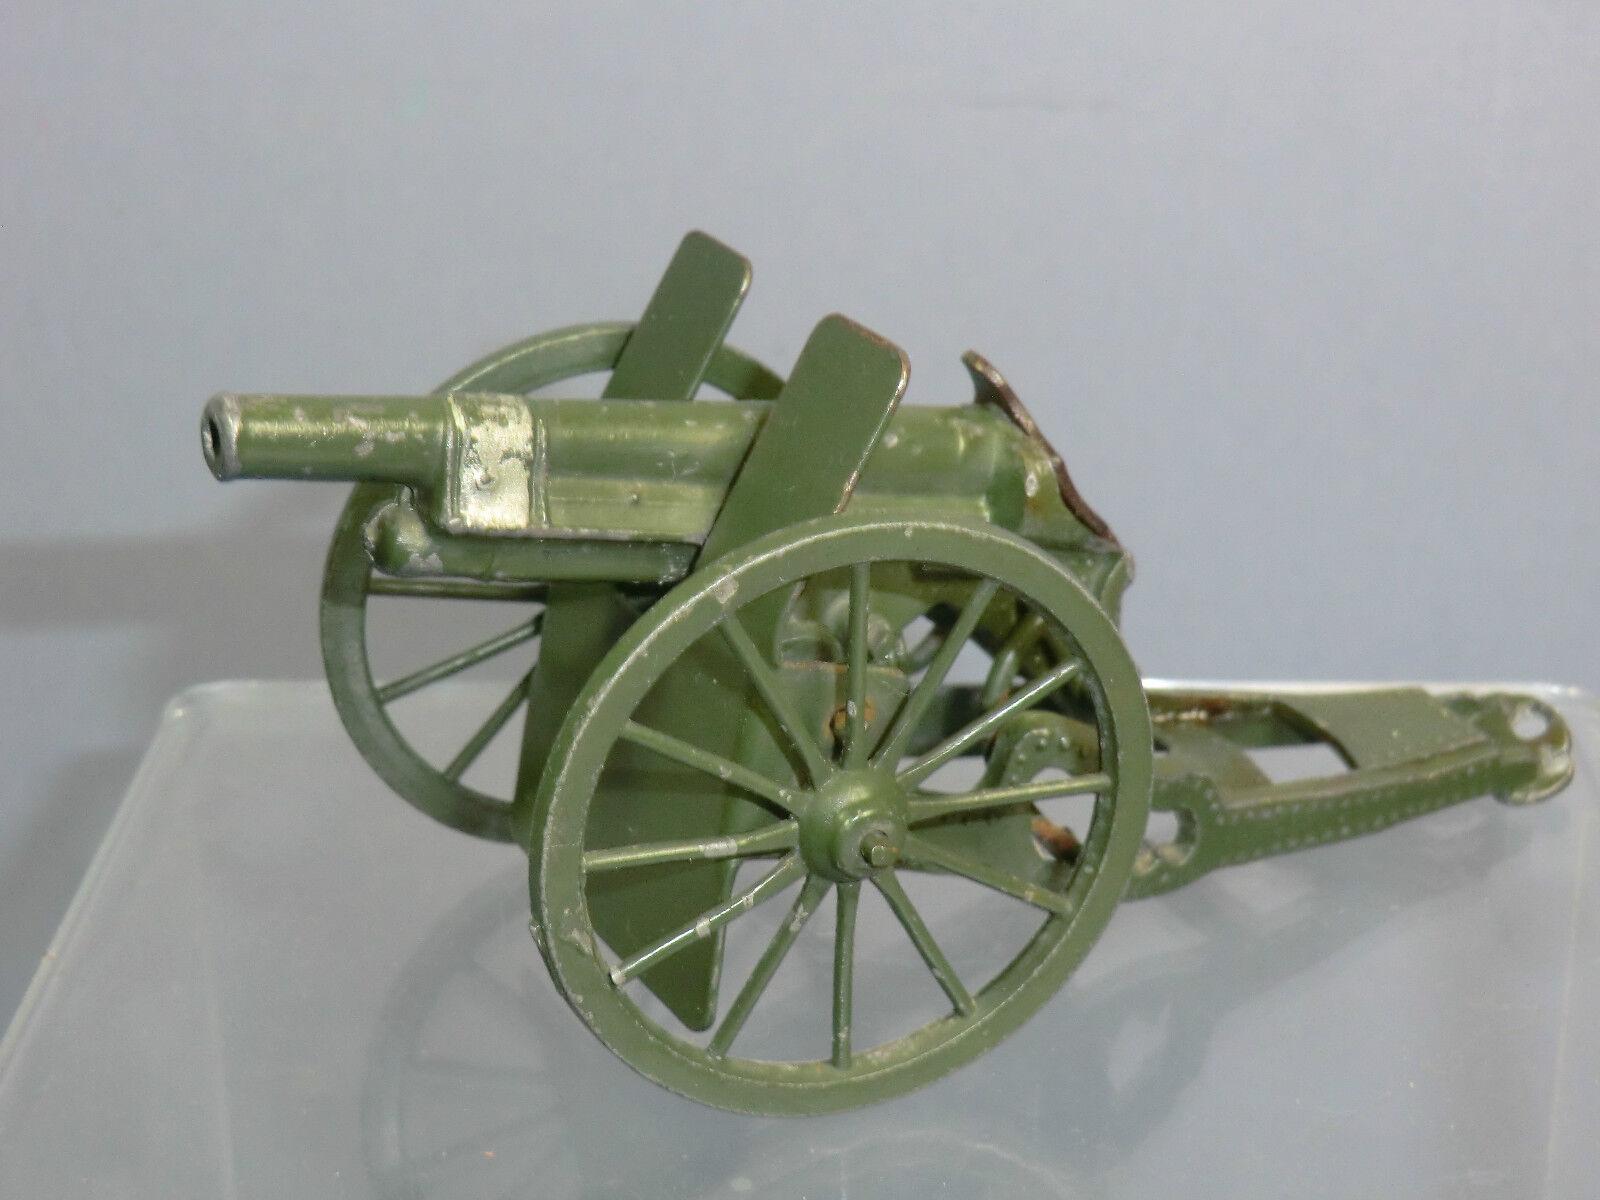 VINTAGE BRITAINS MODEL No.9710 R. A, pistolet